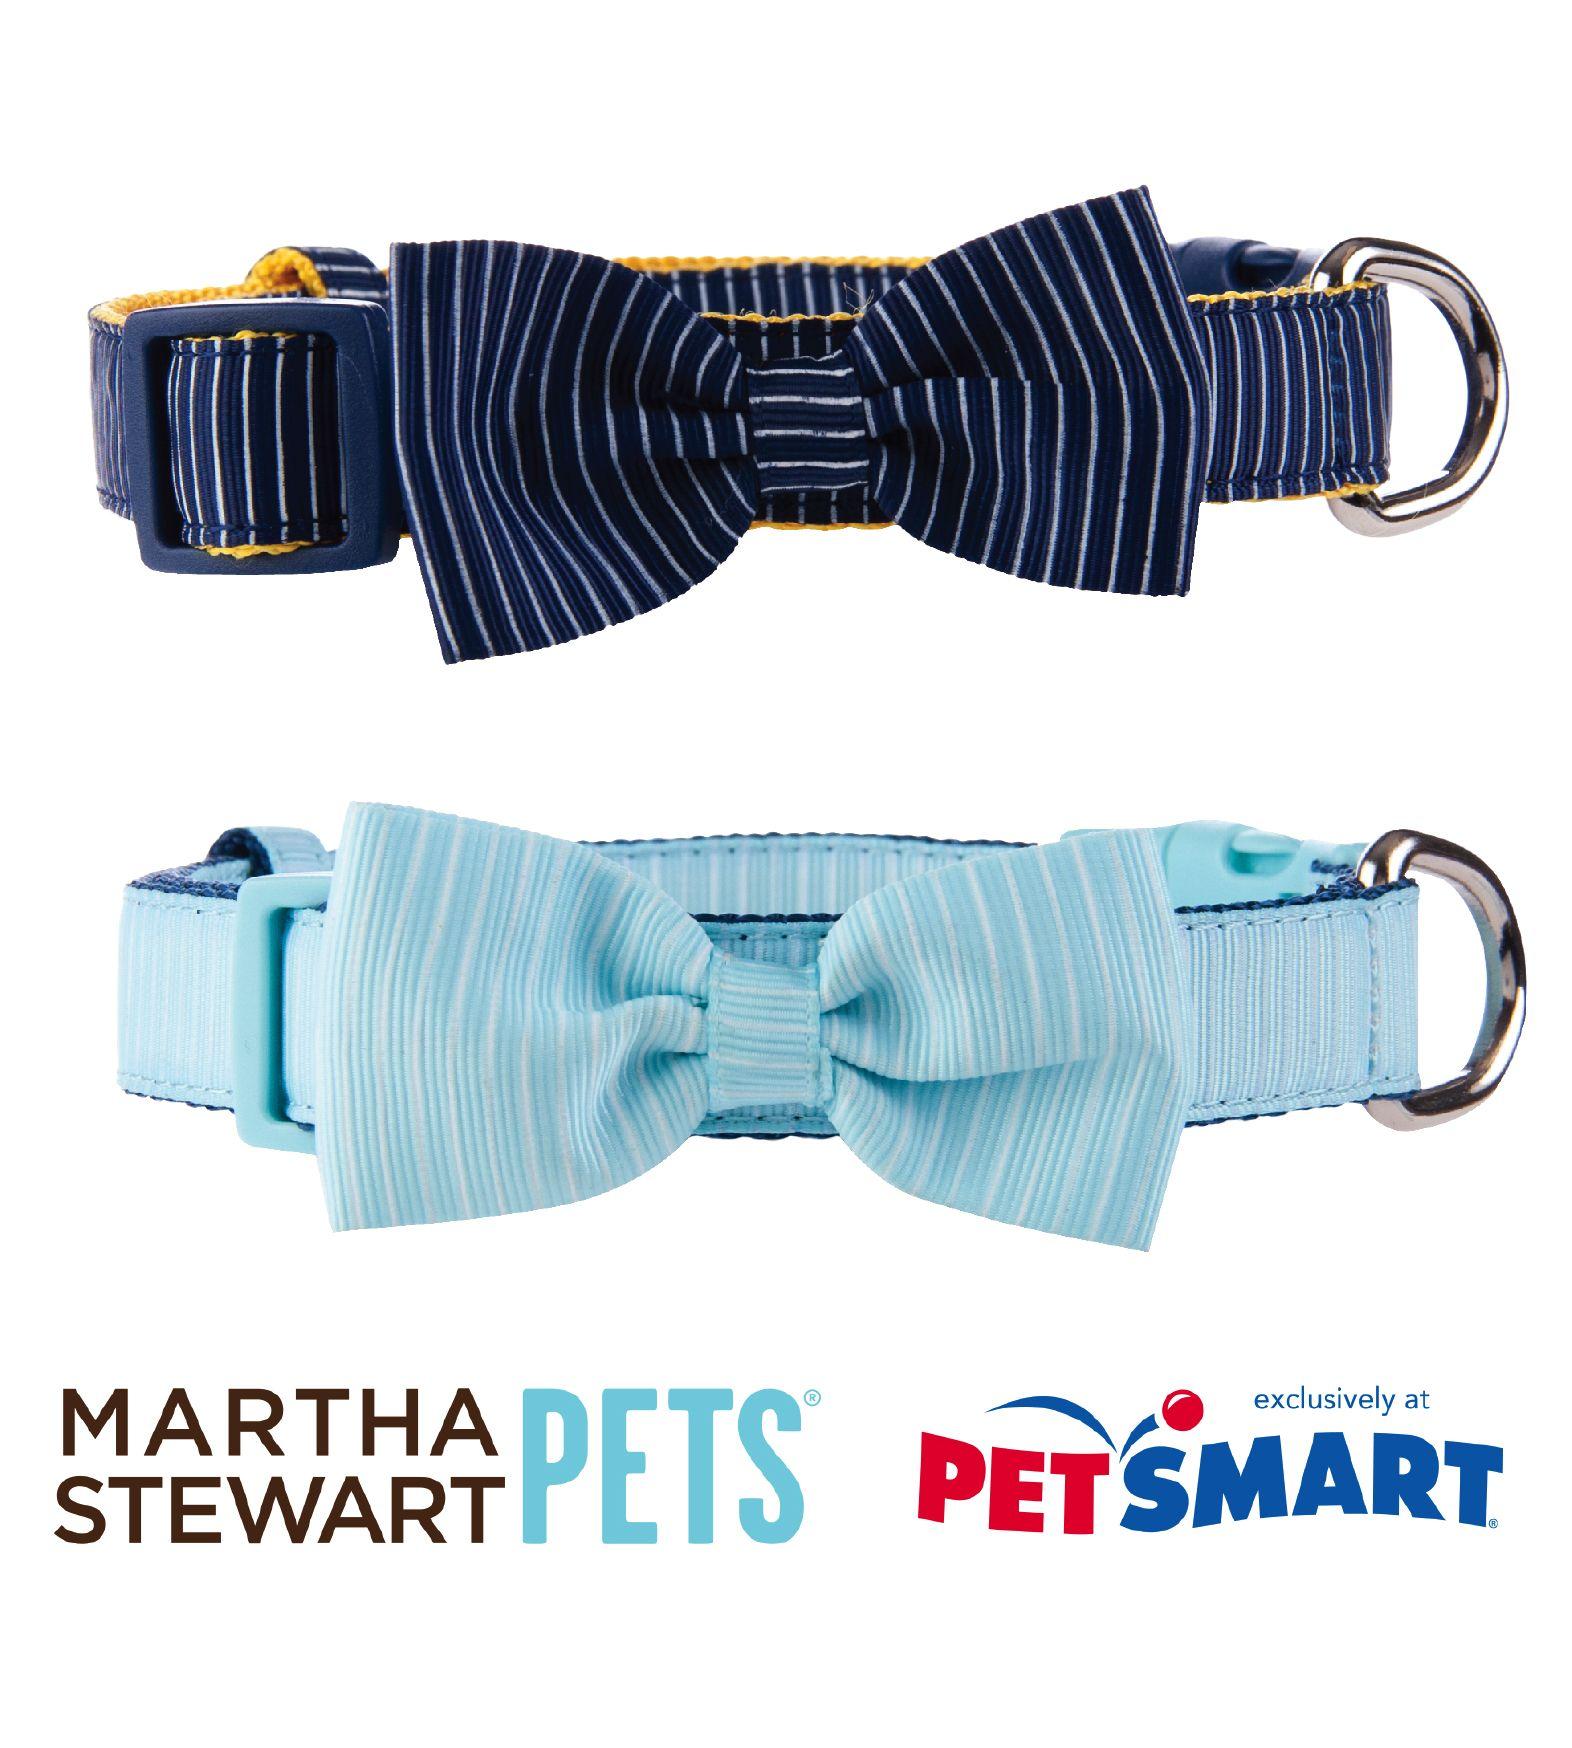 Pin By Martha Stewart Weddings On Pets At Weddings Pets Martha